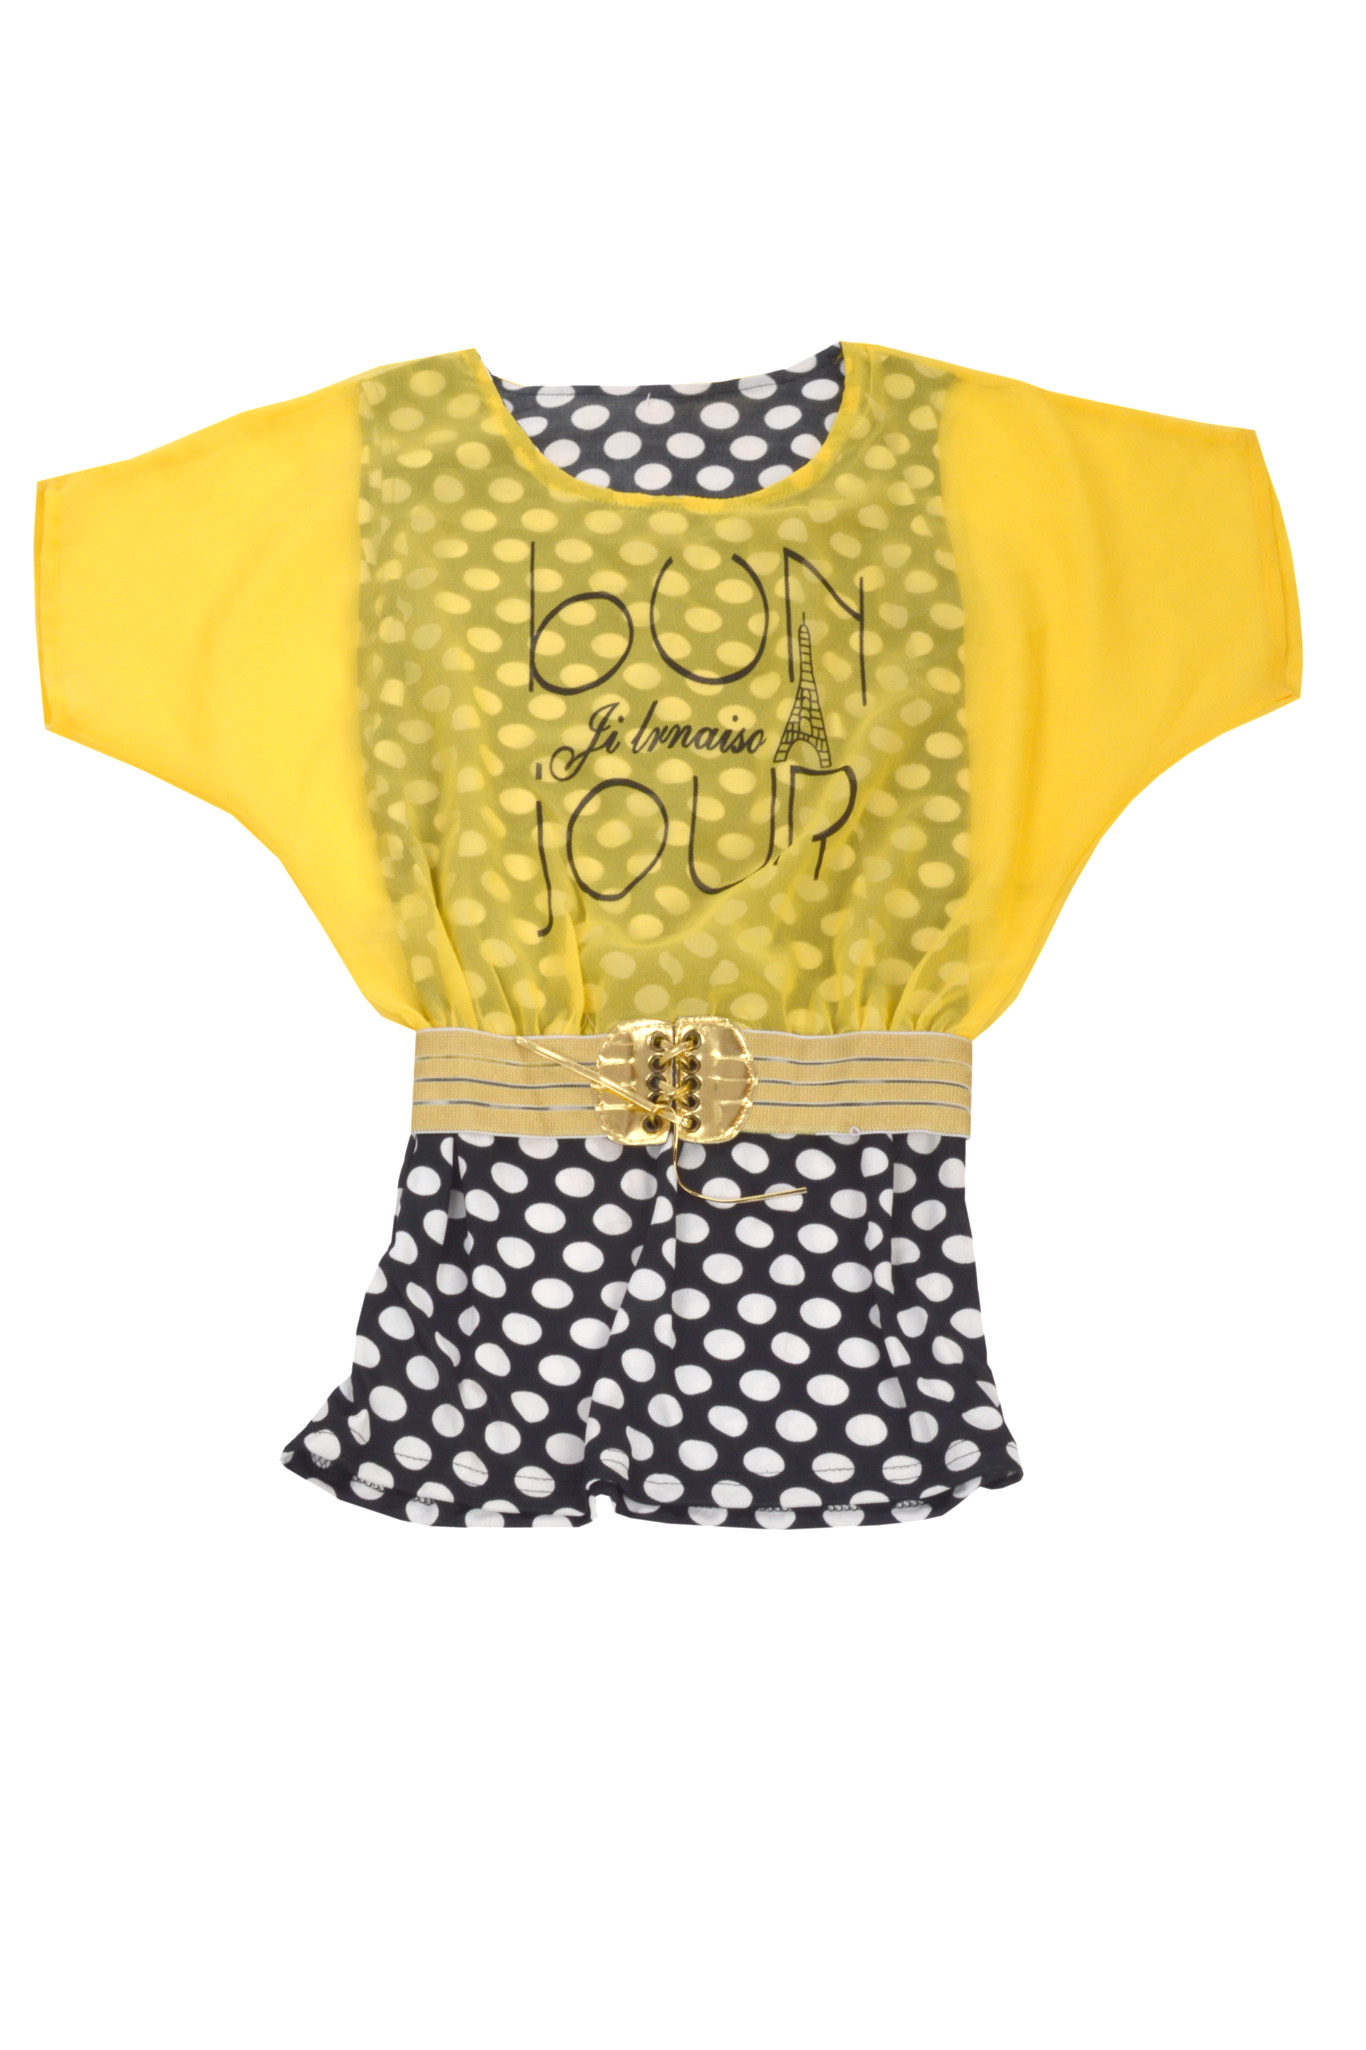 Beautiful Yellow & Black Top